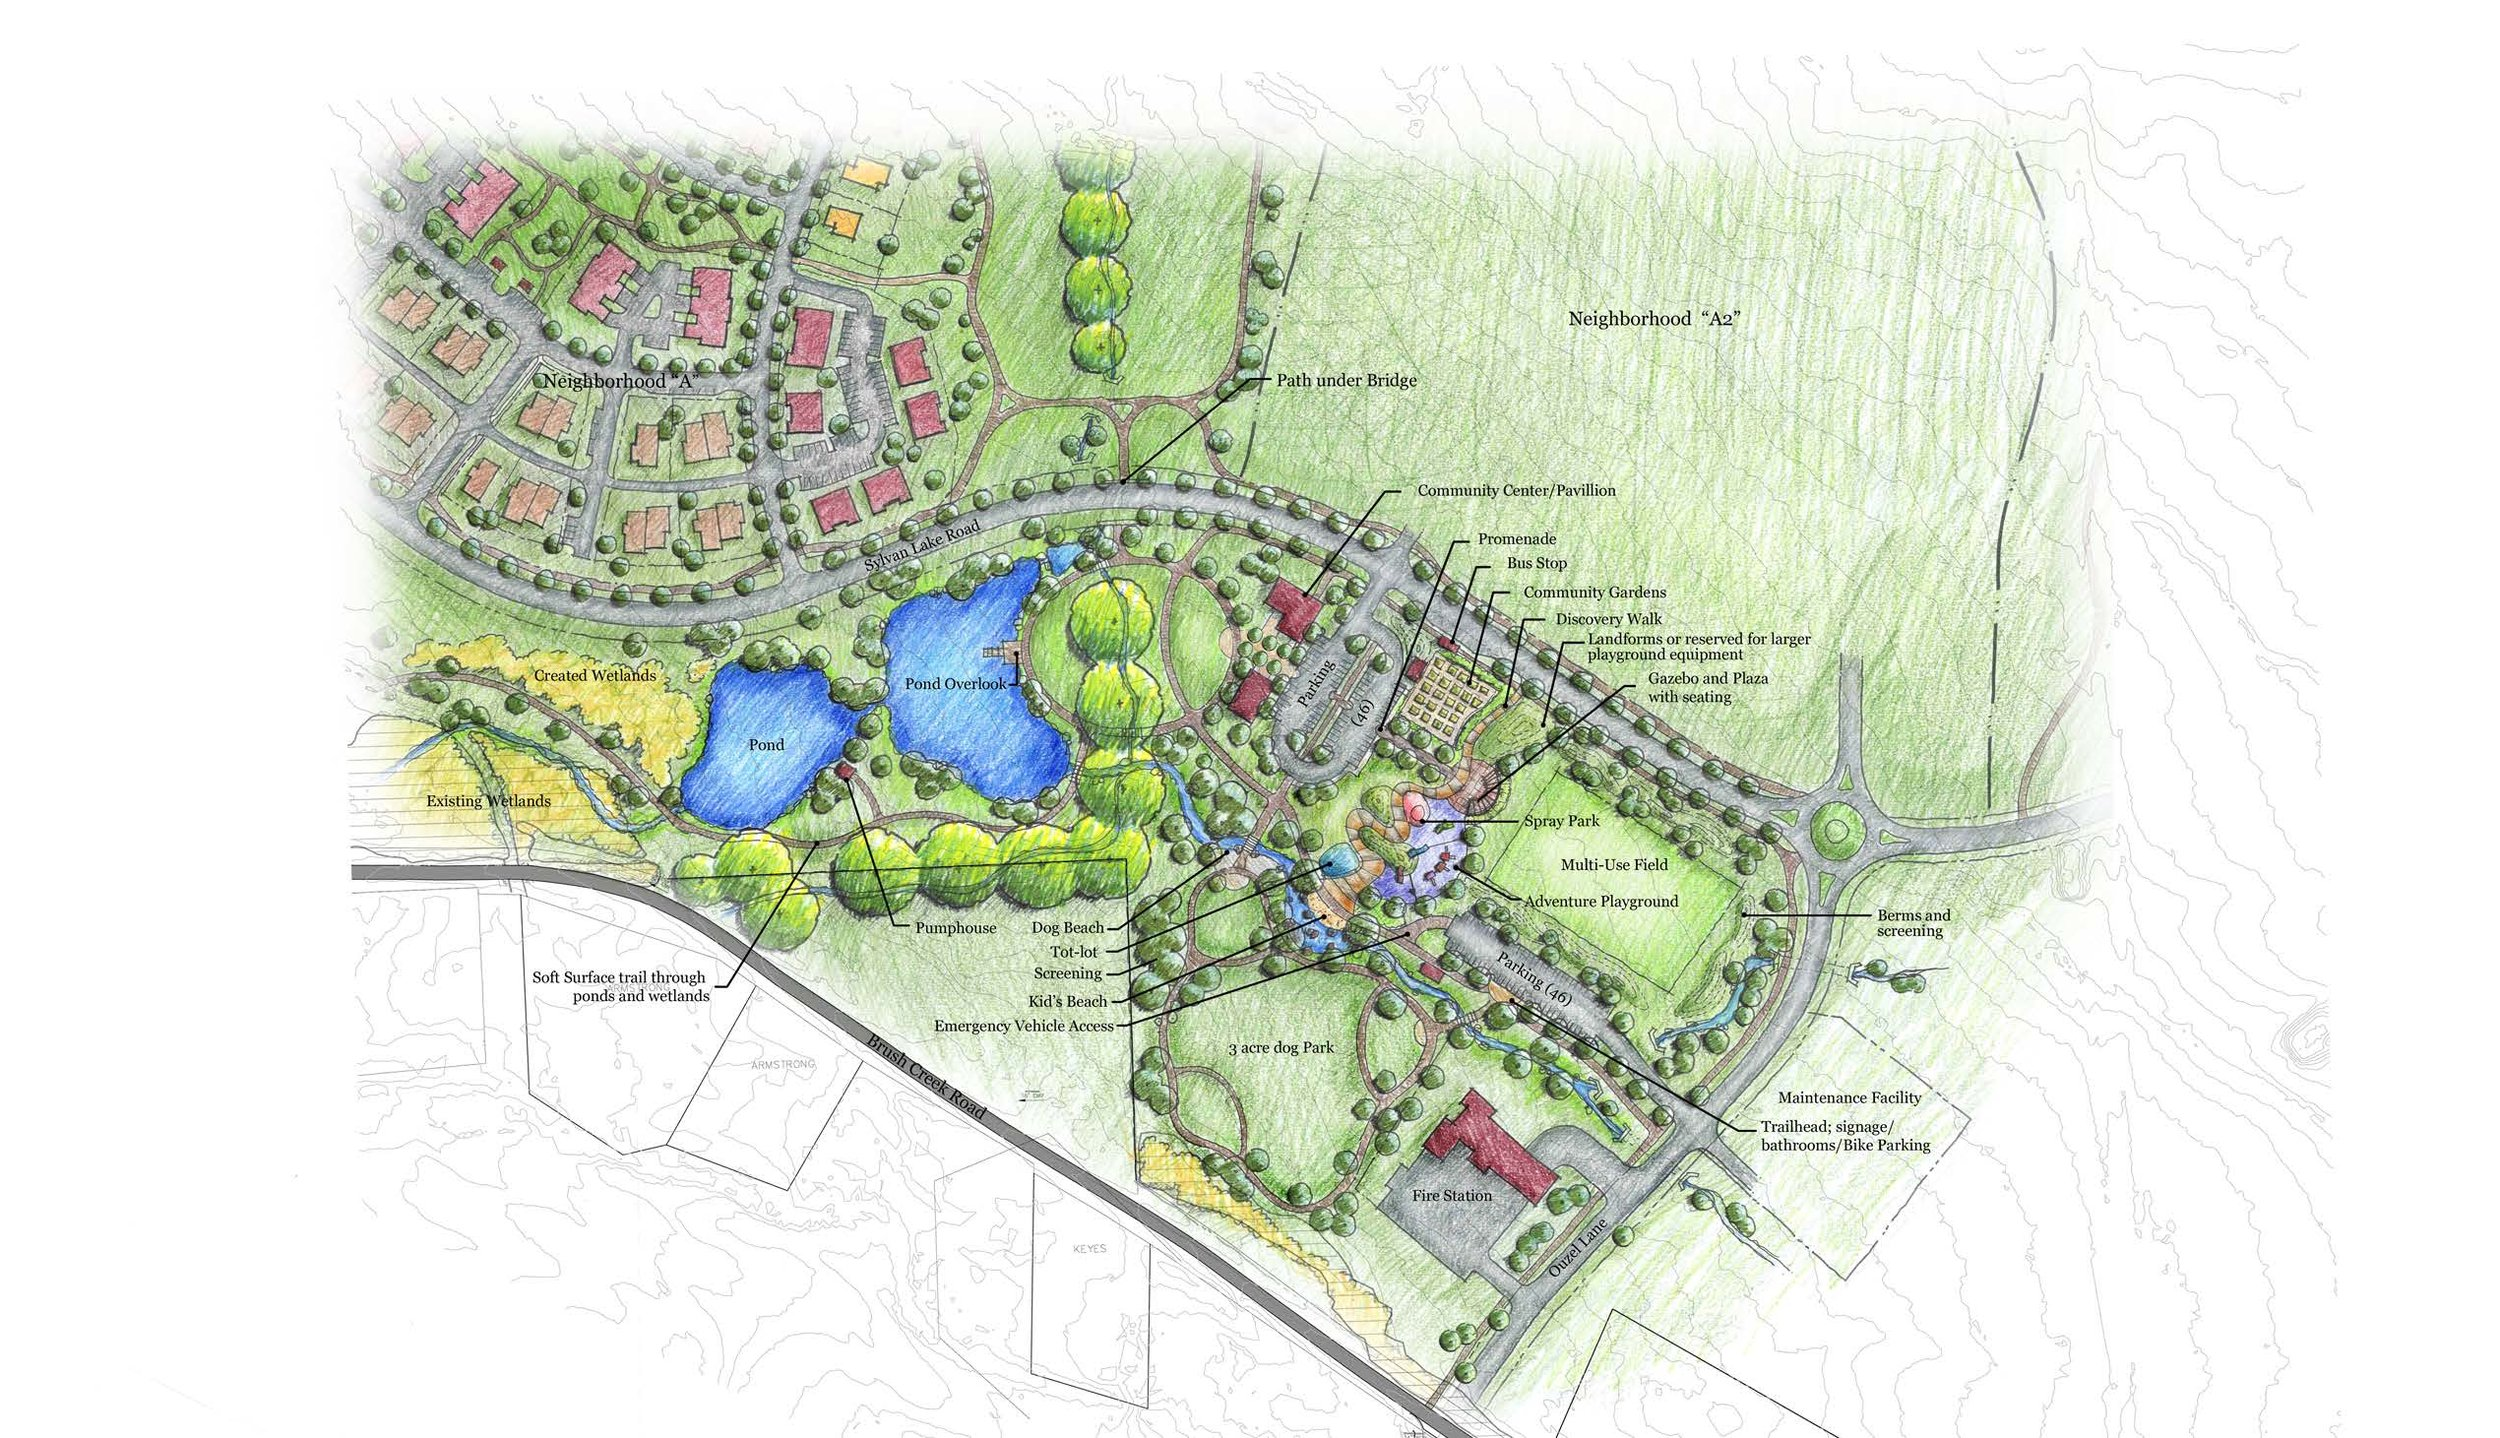 08.15.13_Conceptual Park Plan_11x17.jpg